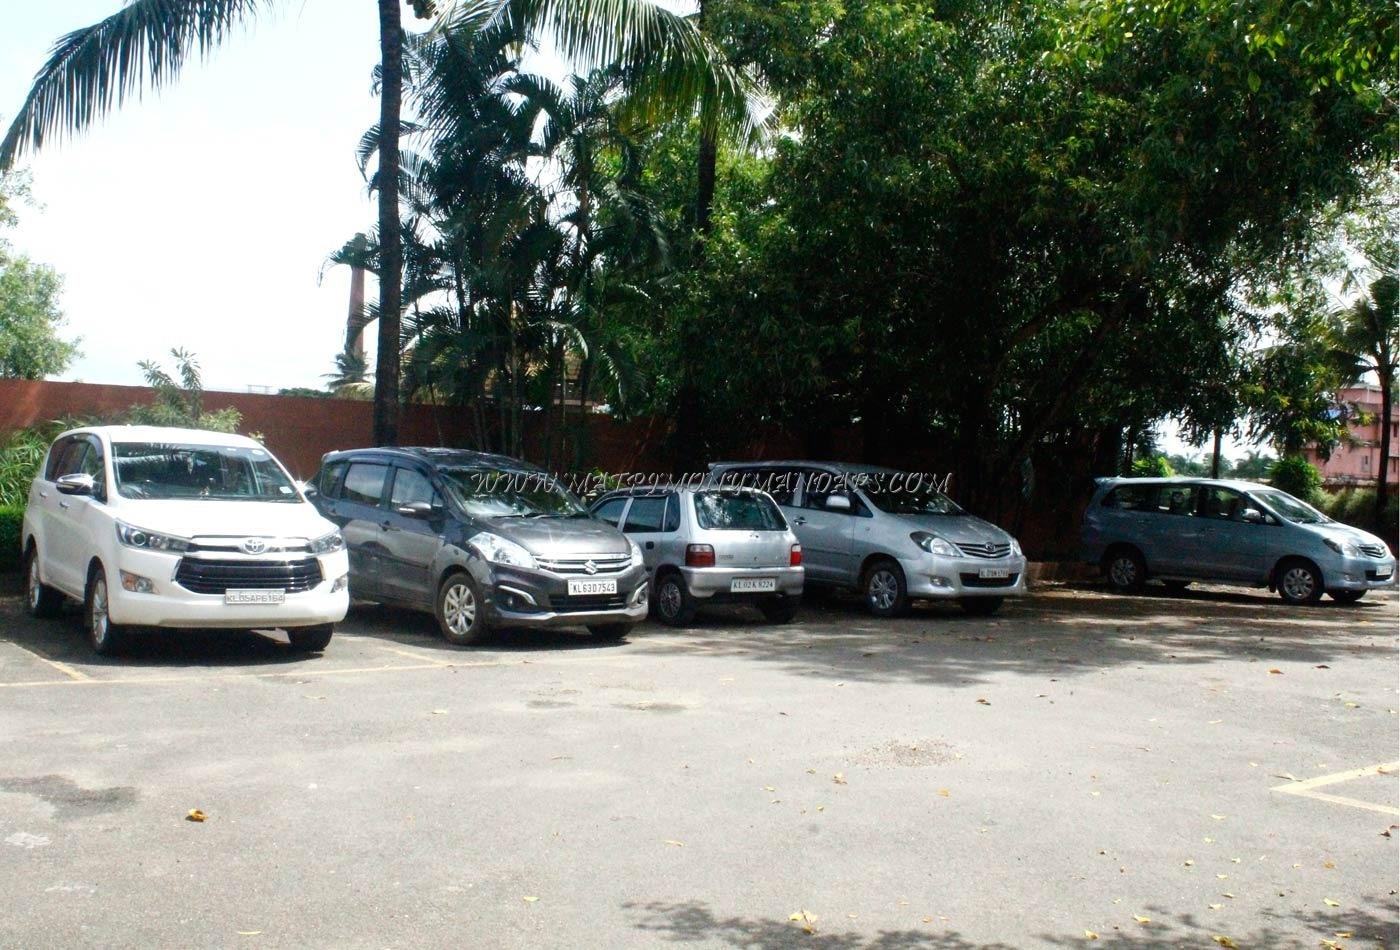 SAJ Earth Resort - Car Parking